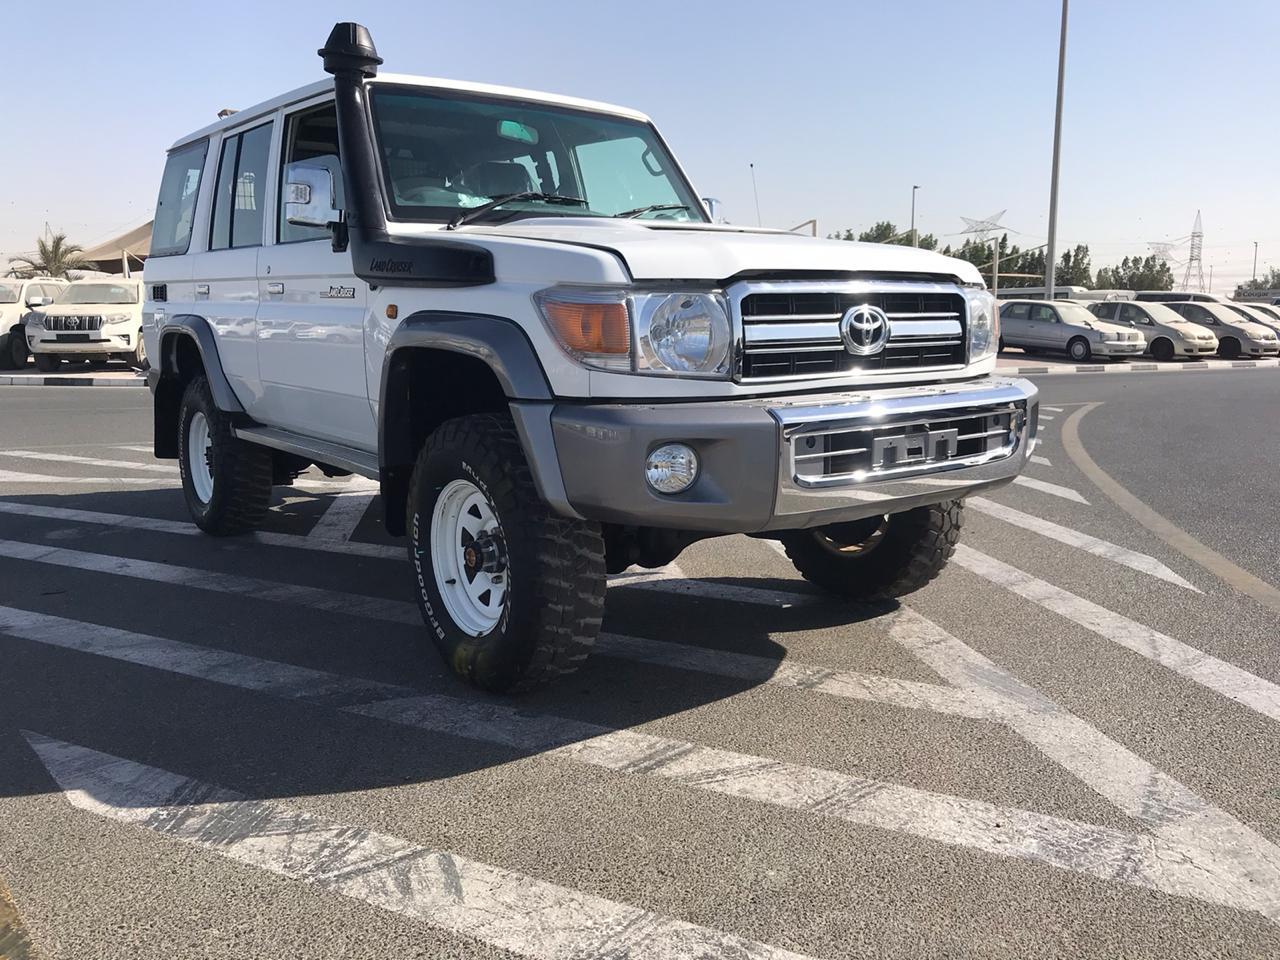 Used RHD Toyota Land Cruiser Hardtop LC76 4.5L Diesel 2012 Model